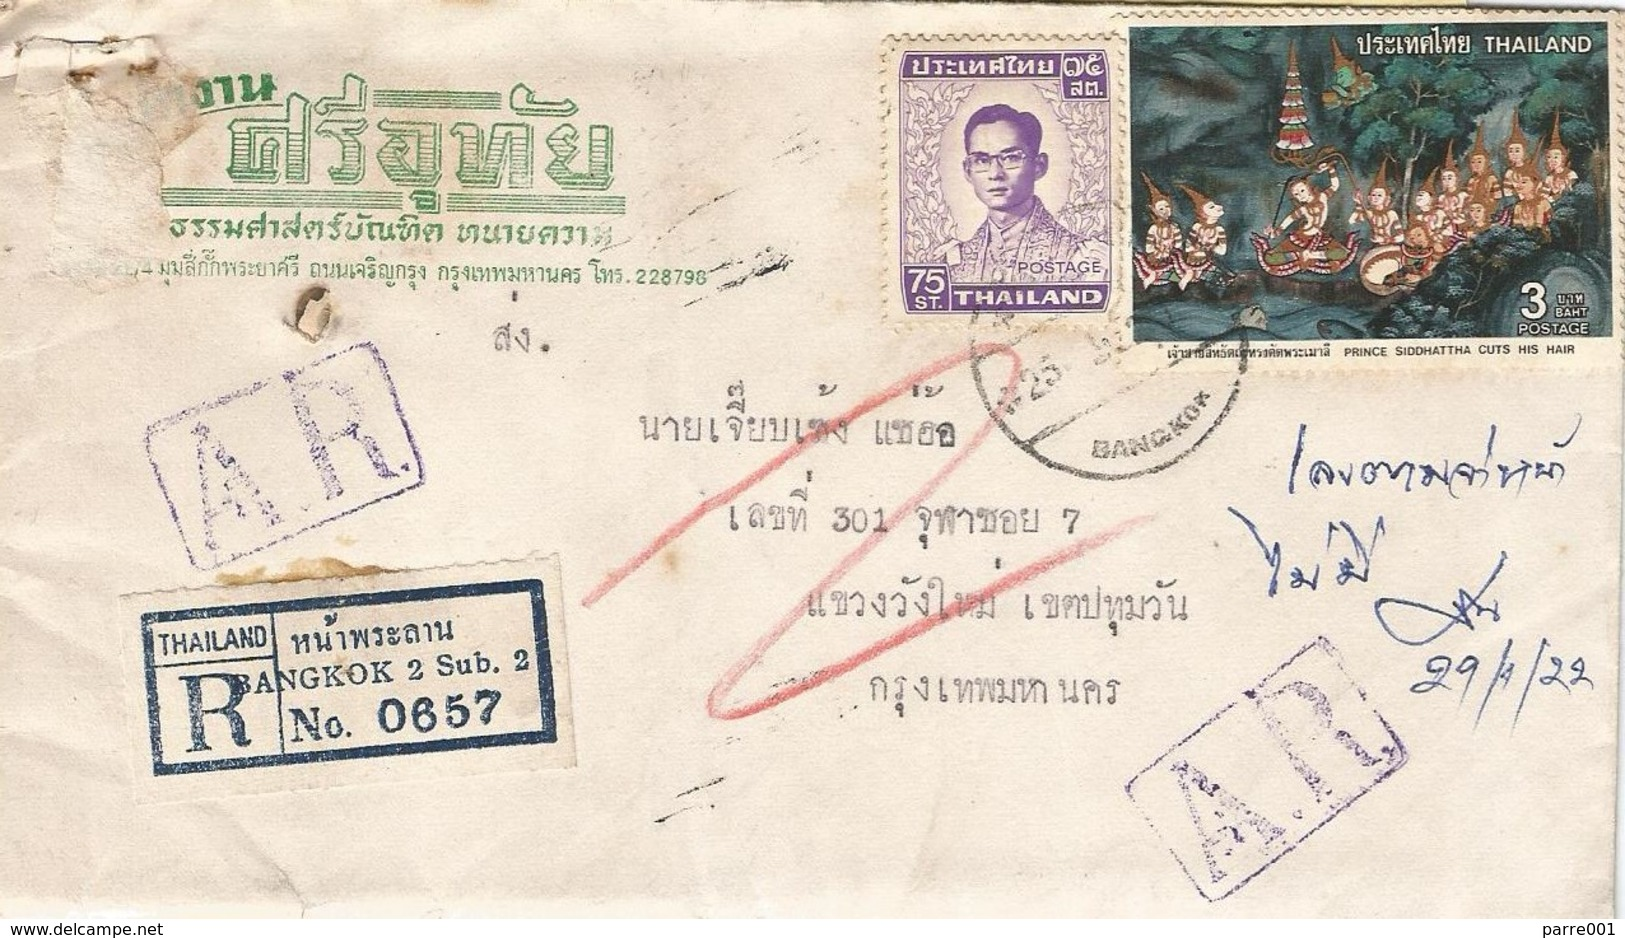 Thailand 1978 Bangkok 2 Buddhism Cutting Hair Registered AR Advice Of Receipt Returned Domestic Cover - Boeddhisme